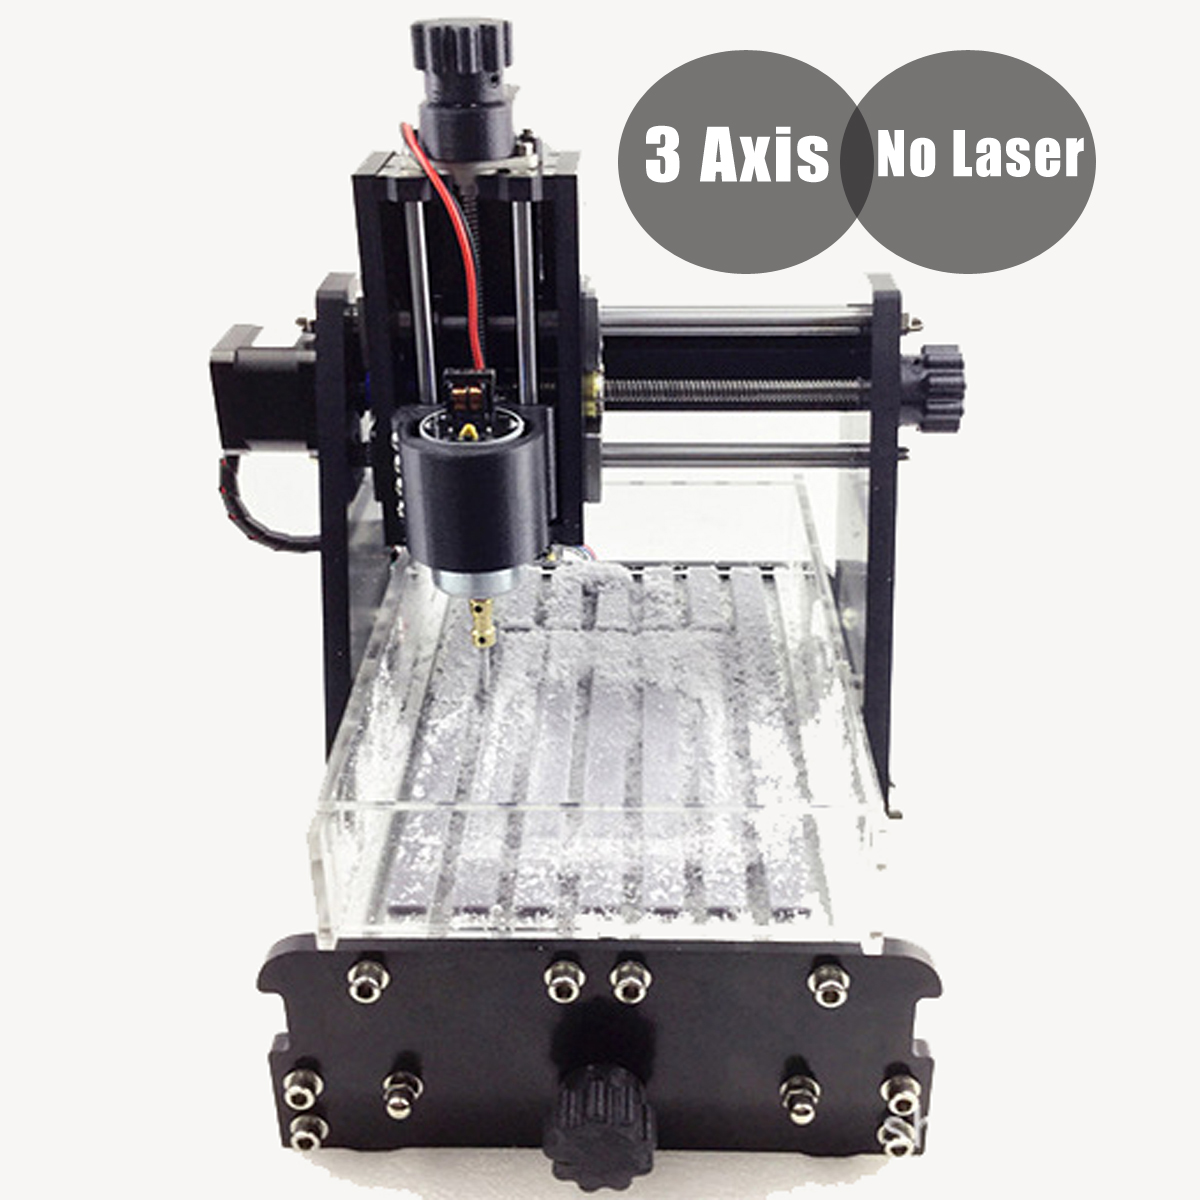 DIY мини гравировка машина 3 Axis ЧПУ гравировка резки ПВХ фрезерный станок гравер без Лазерная 100 В 240 В древесины маршрутизатор